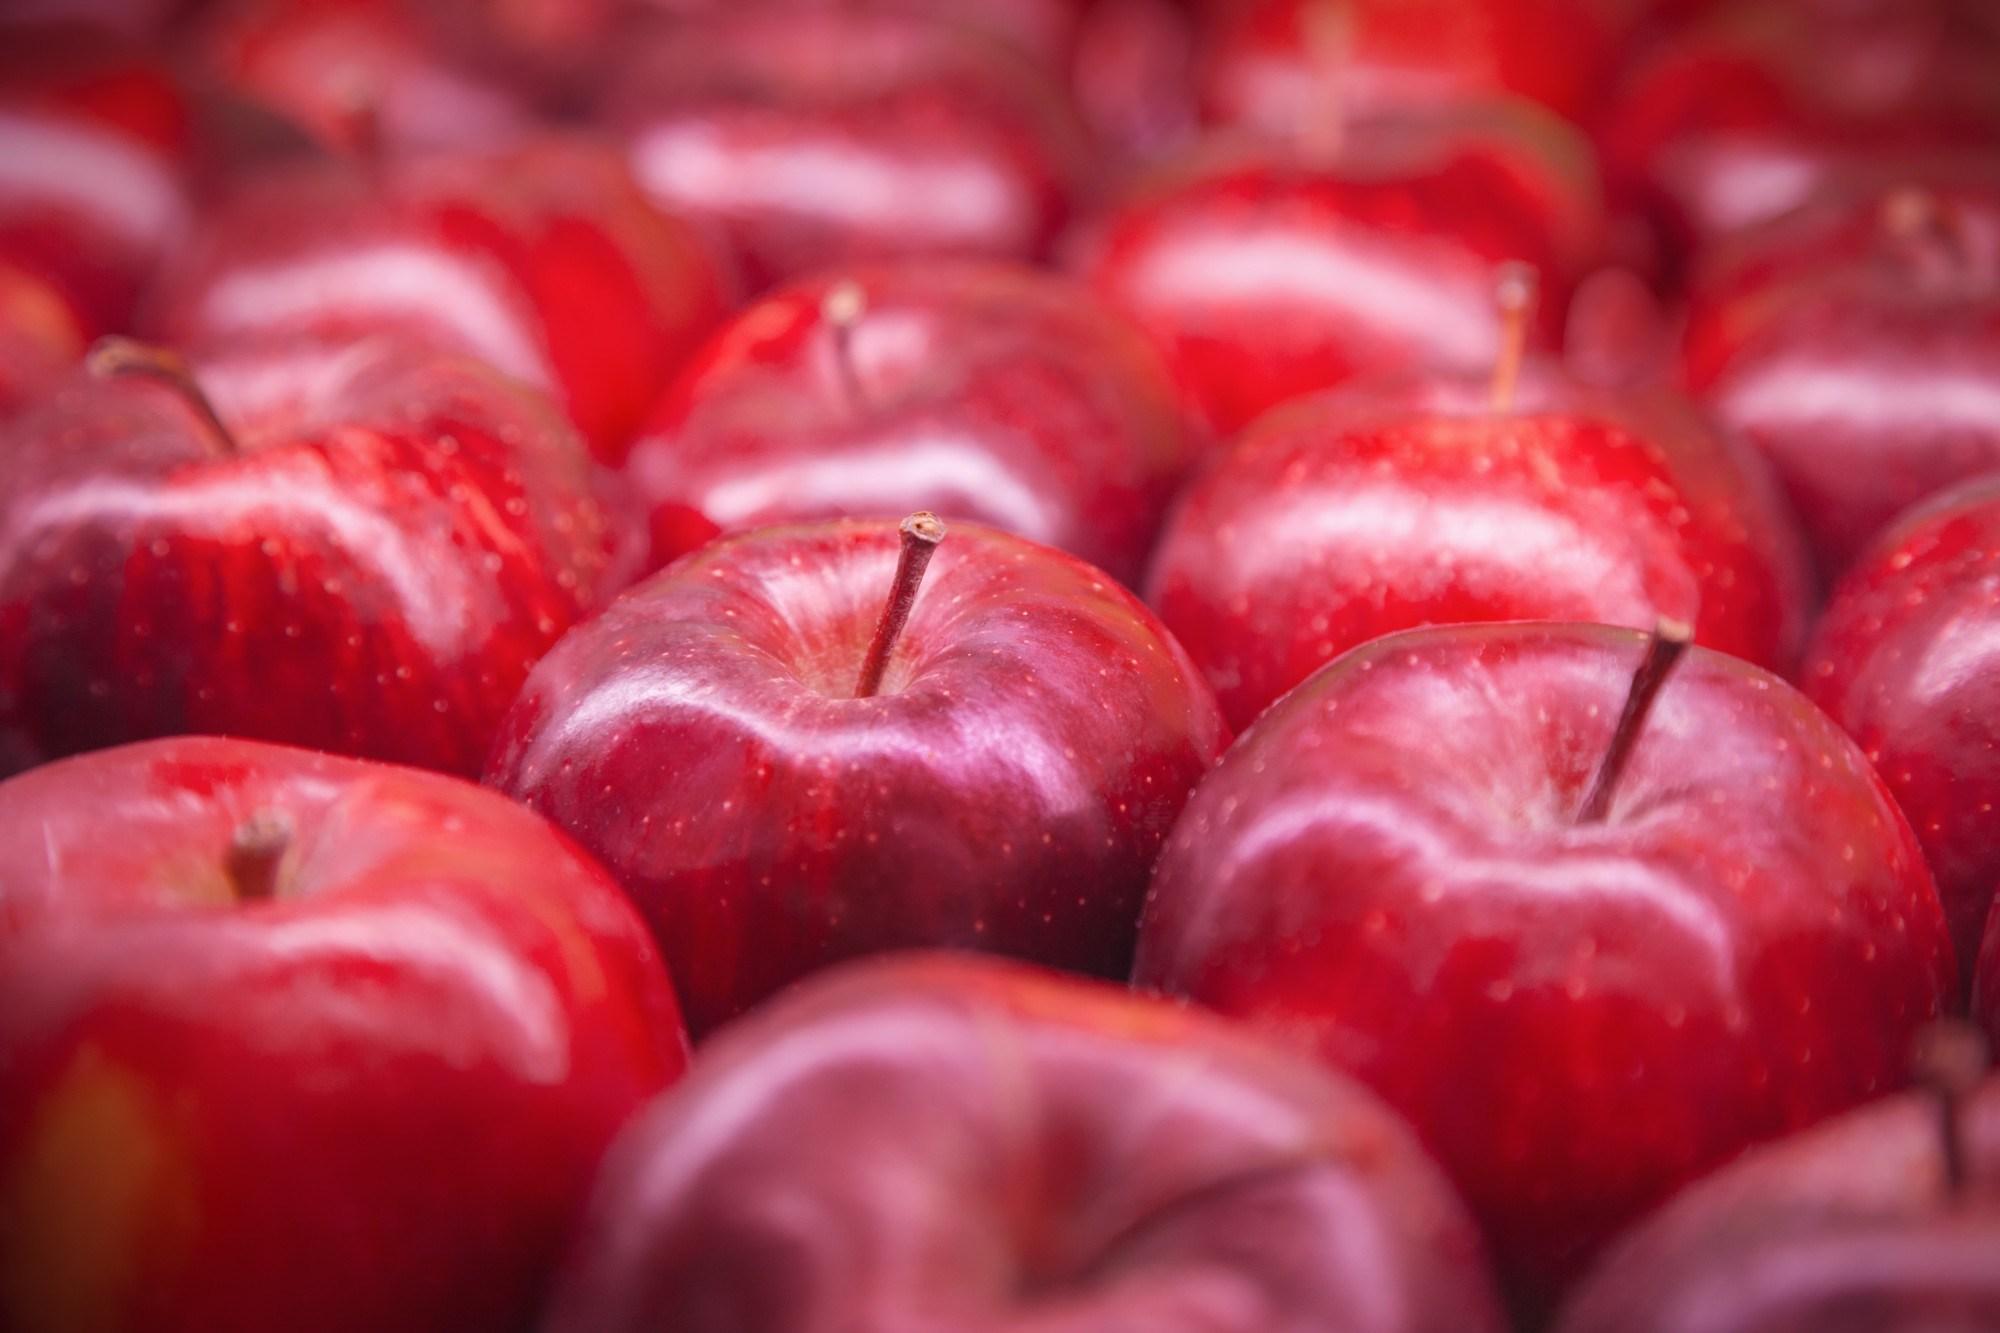 Benefits Of Apple Cider Vinegar In Capsule Form